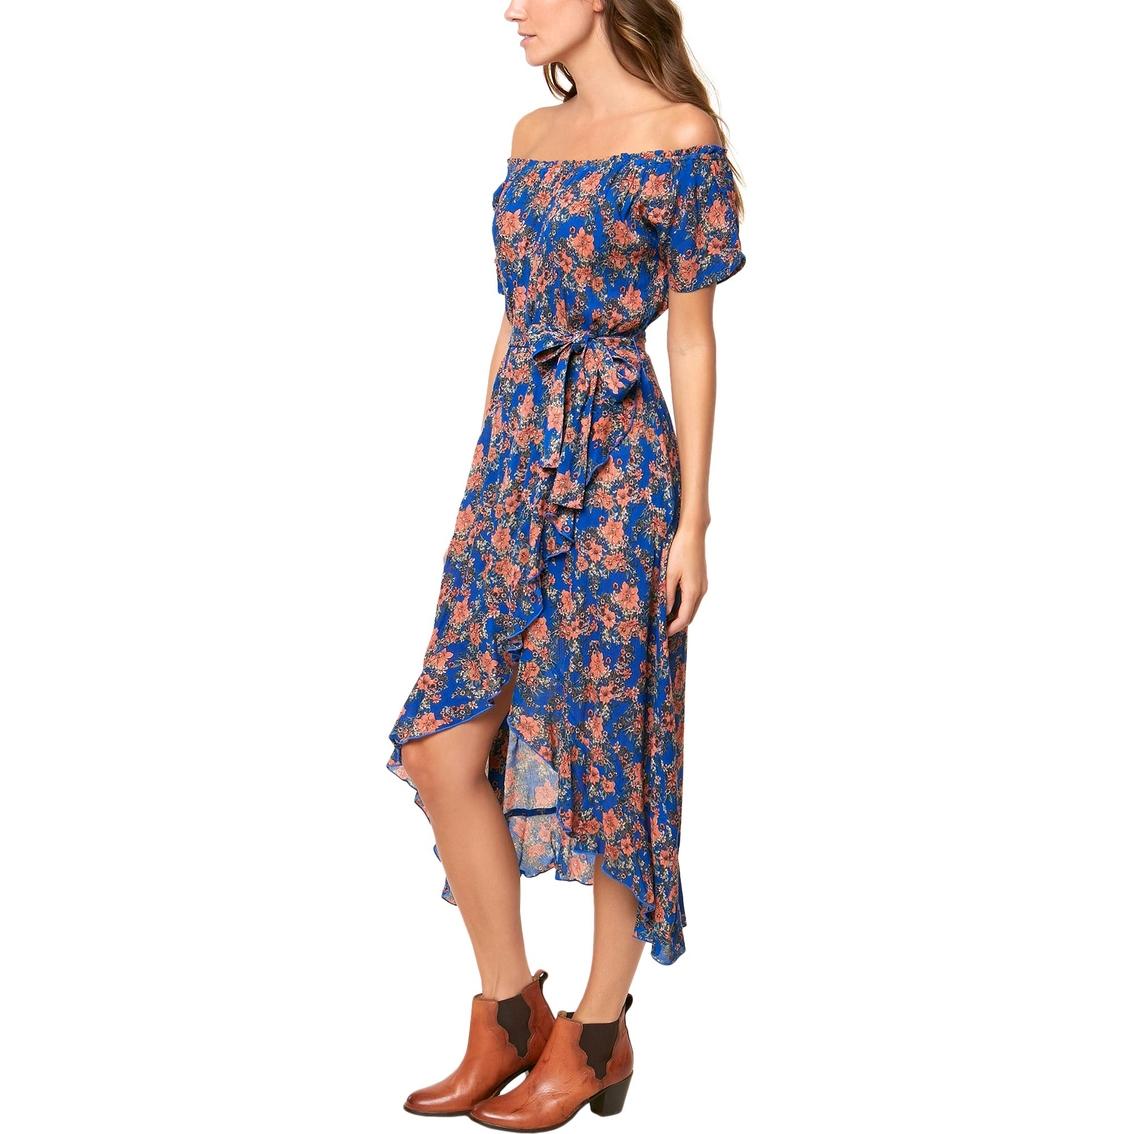 a7bf465abc6 O neill Juniors Constance Off The Shoulder Floral Wrap Maxi Dress ...